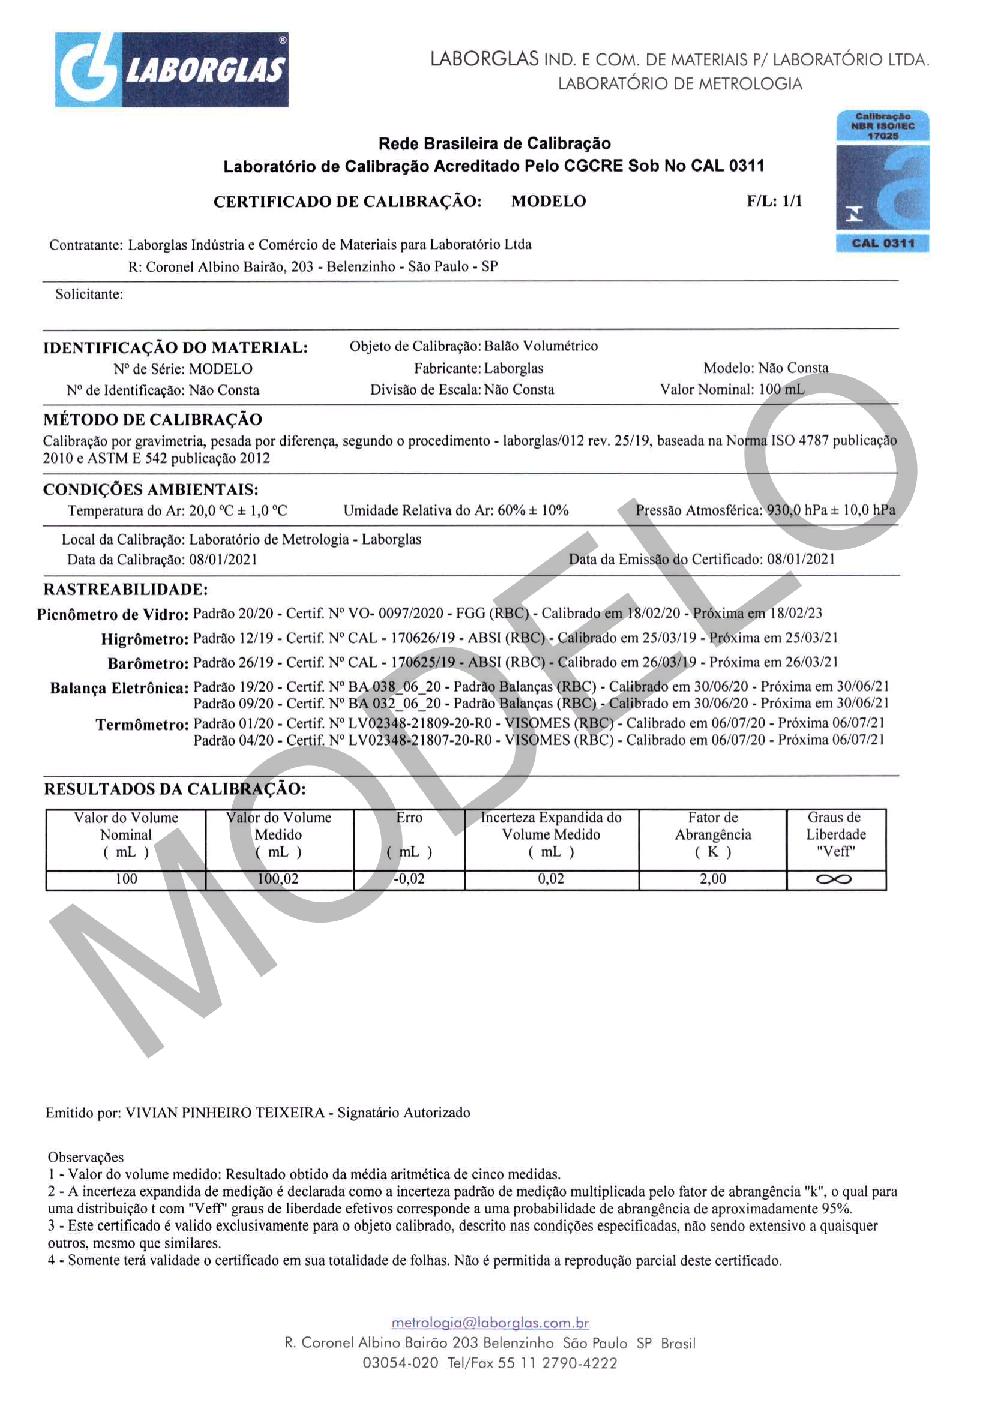 BALÃO VOLUMÉTRICO CLASSE A ROLHA POLI ÂMBAR C/ CERTIFICADO RBC 40 ML - Marca Laborglas - Cód. 91678166-R